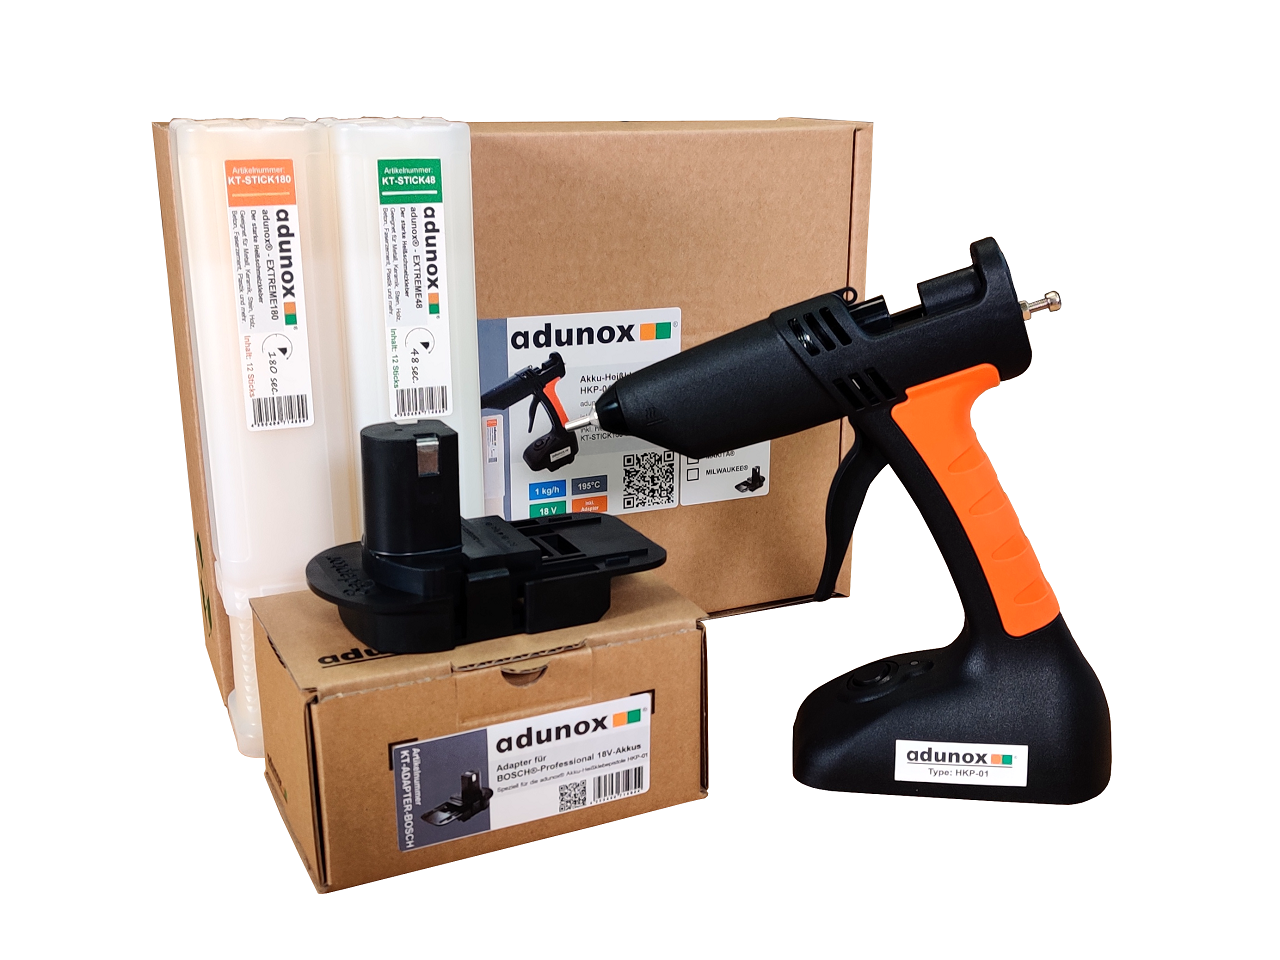 Akku-Heißklebepistole HKP-01   Adapter für 18V-Akku von Bosch® Professional   1x adunox®-EXTREME48   1x adunox®-EXTREME180